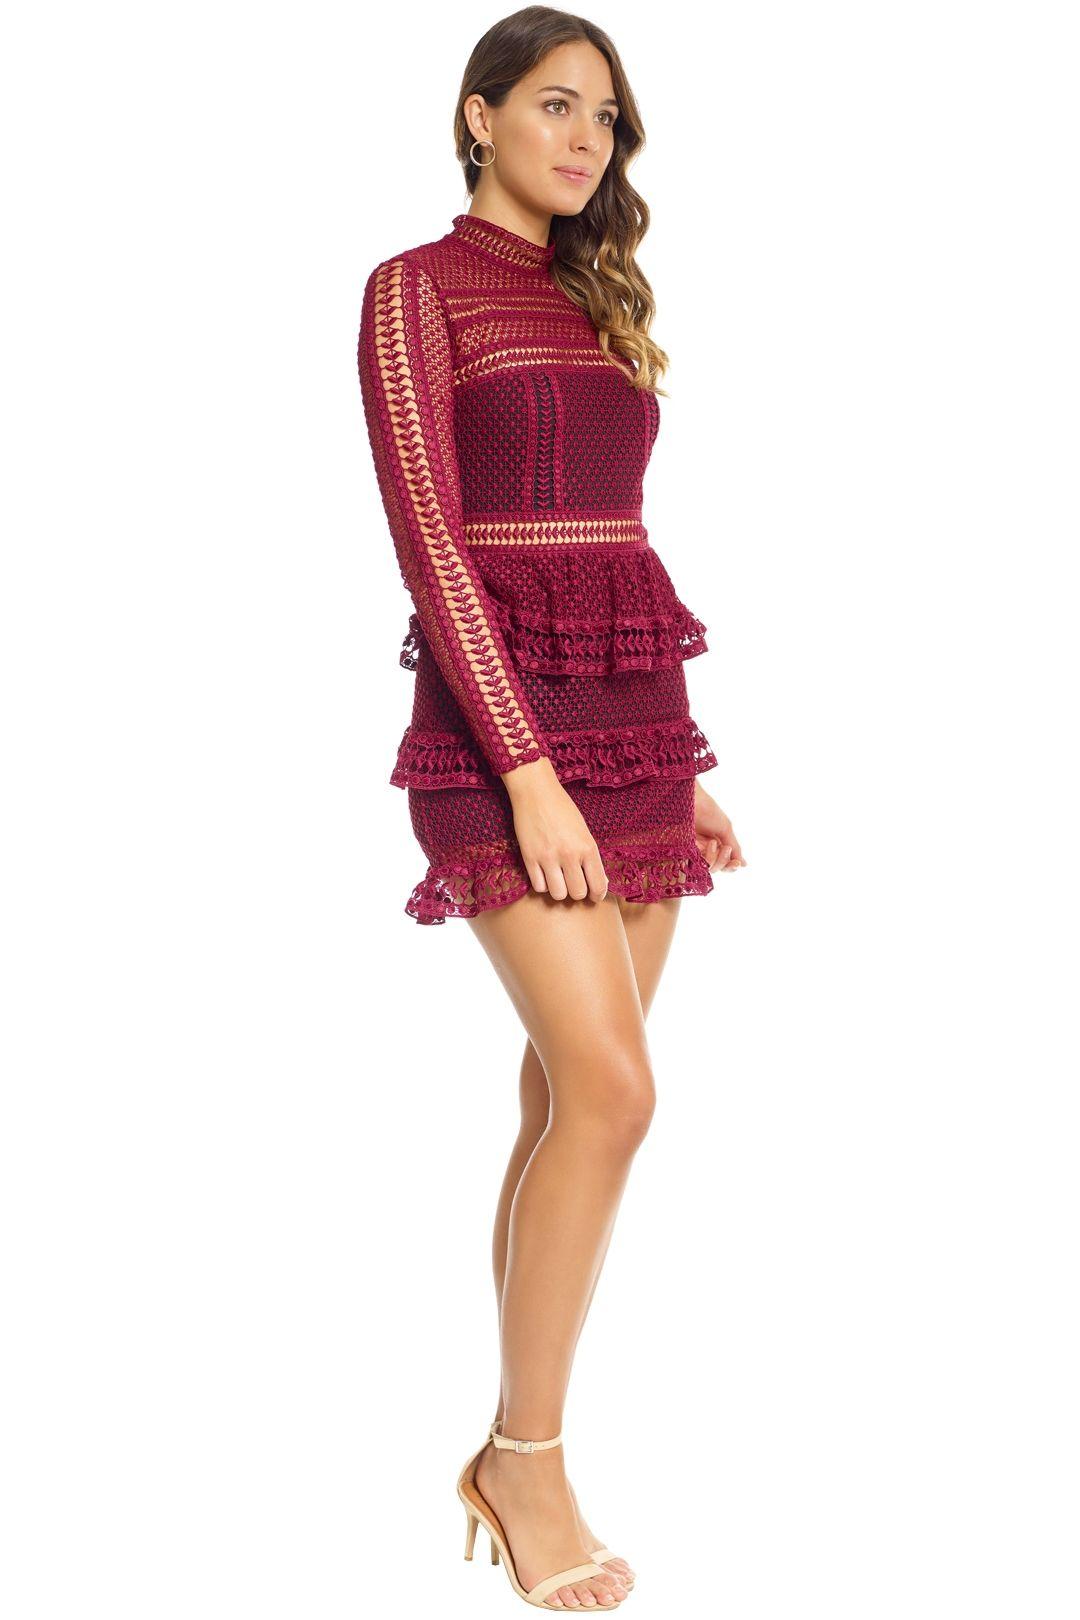 Self Portrait - Tiered Guipure Lace Mini Dress - Maroon - Side